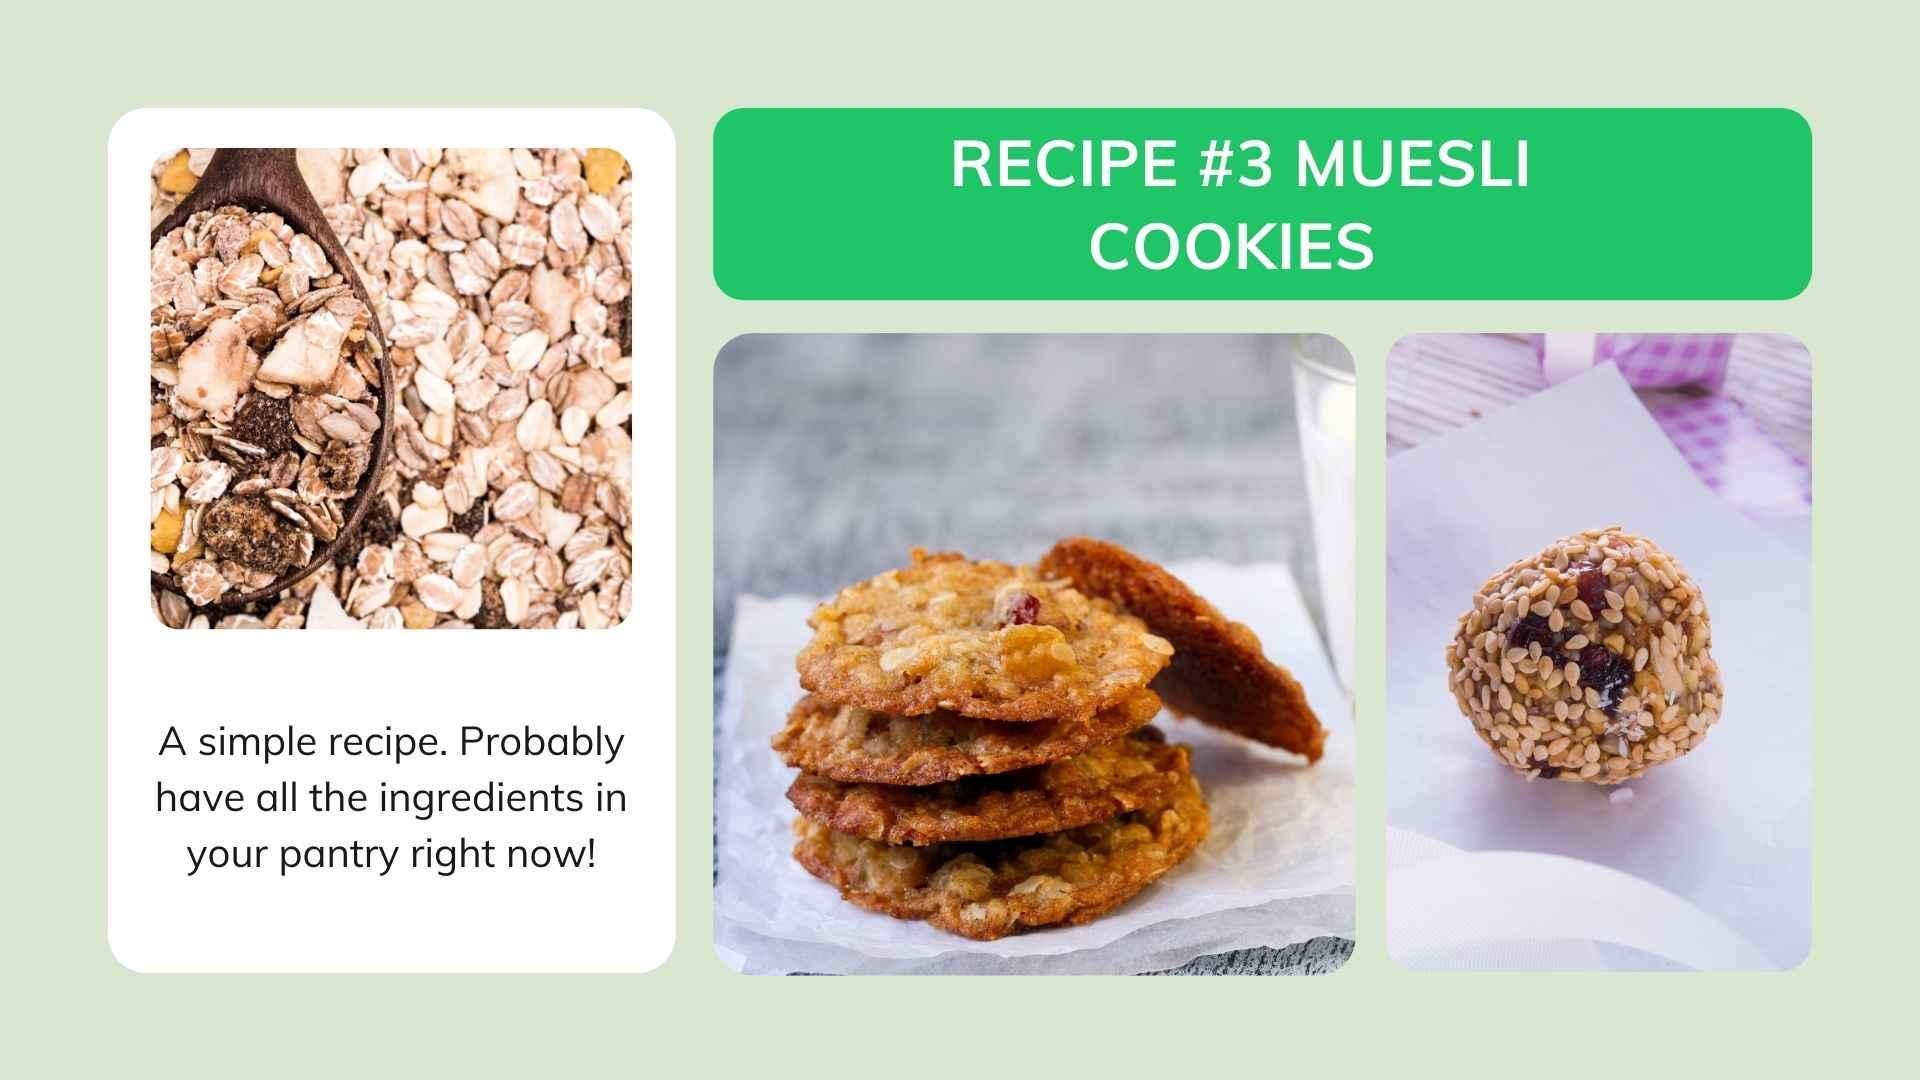 Recipe #3 Muesli Cookies